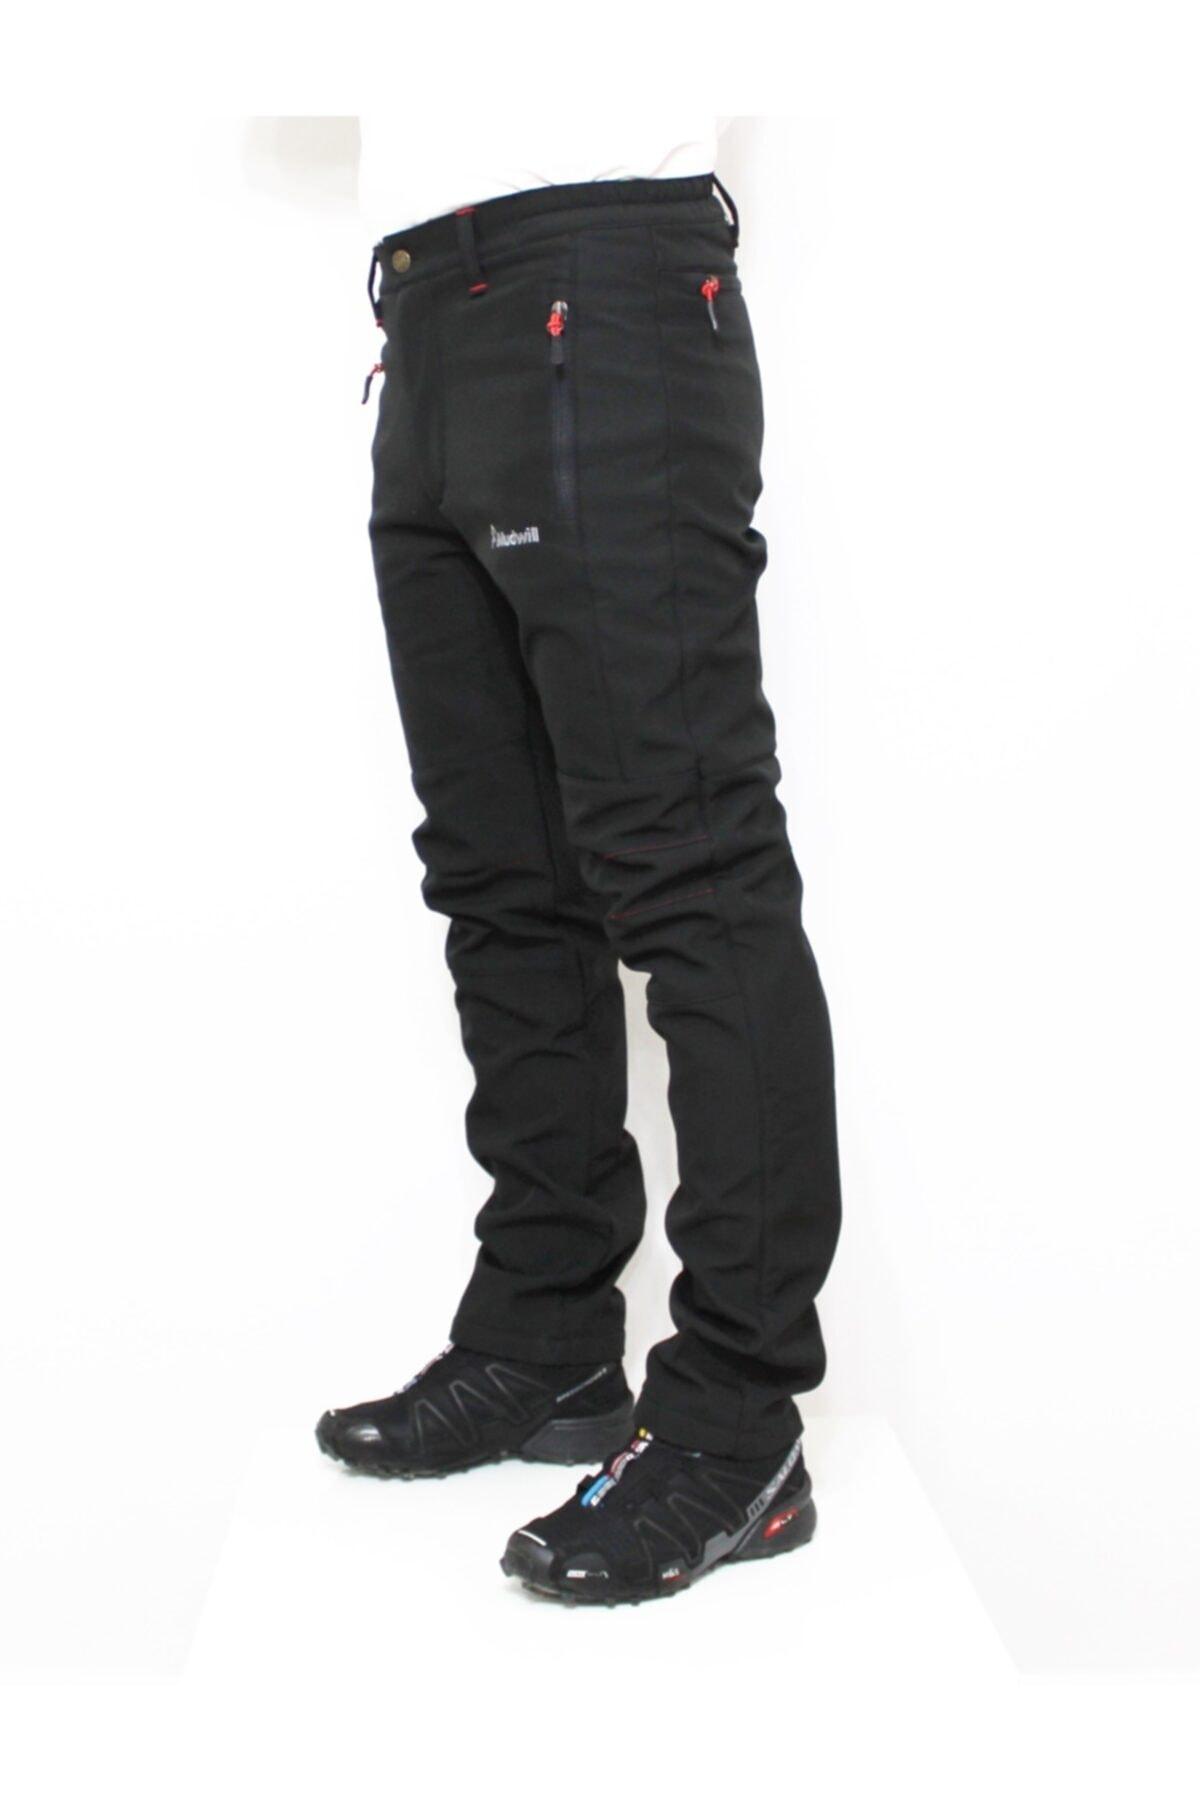 Outdoor Kışlık Softshell Erkek Pantolon